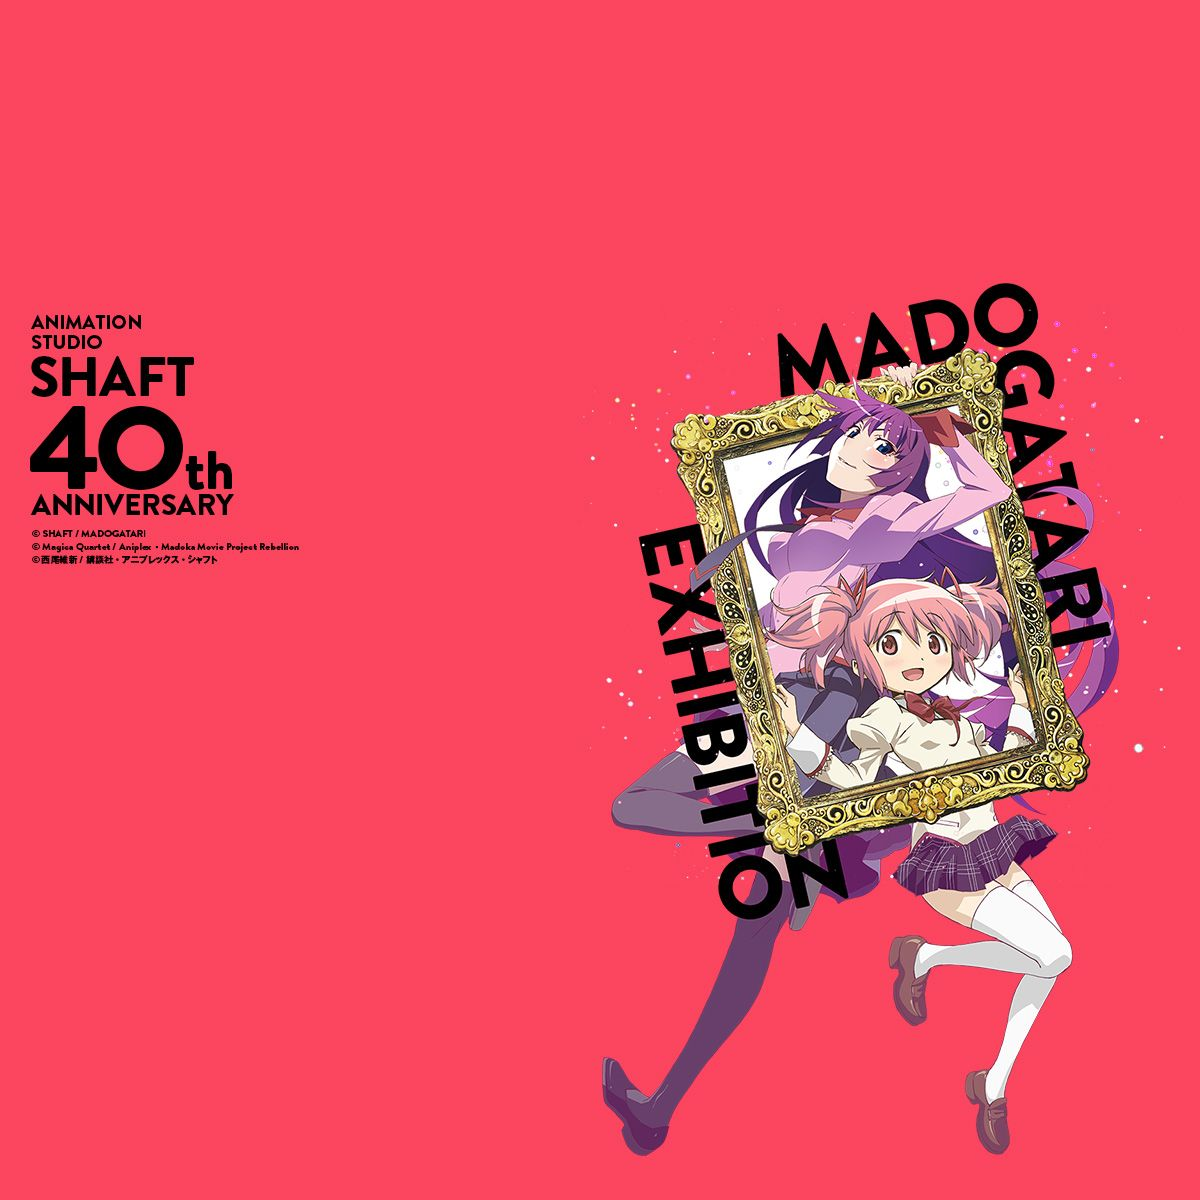 MADOGATARI展[SHAFT 40th ANNIVERSARY]